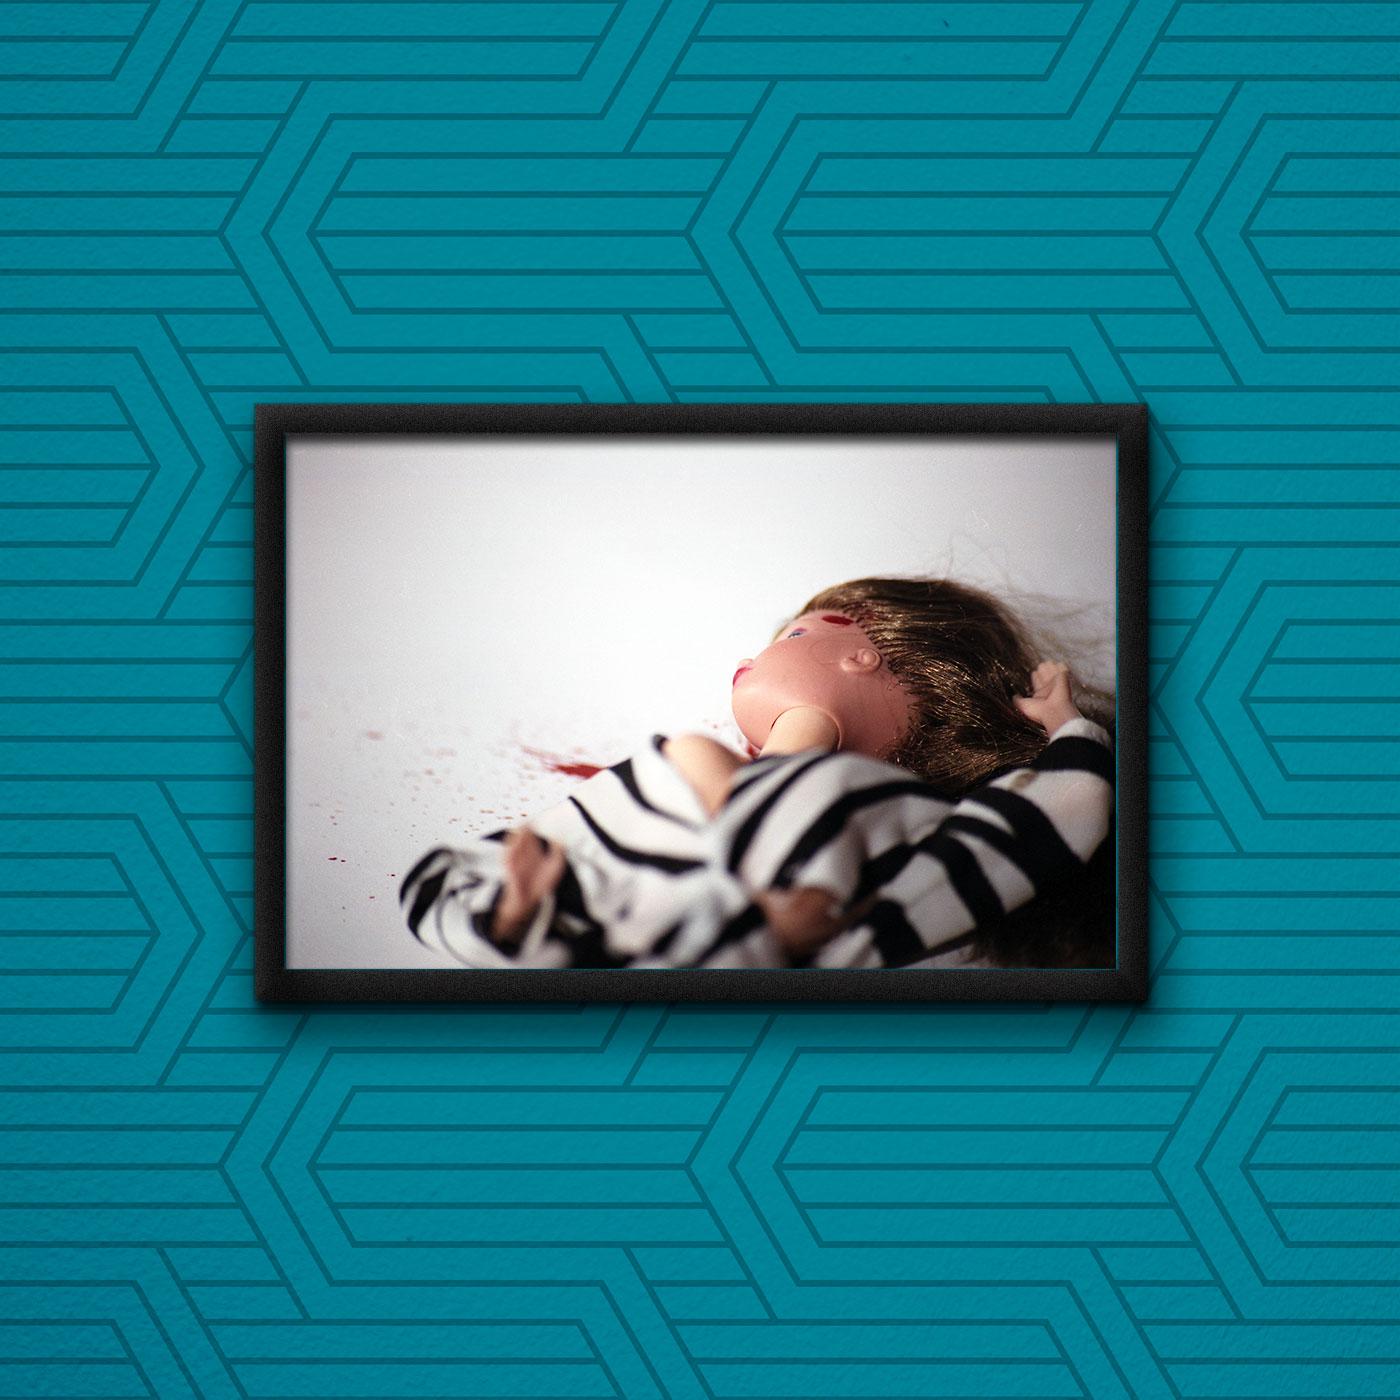 TBM008GS3_BarbieMurdersGunshotPoster_ByWildeDesigns_mockup01